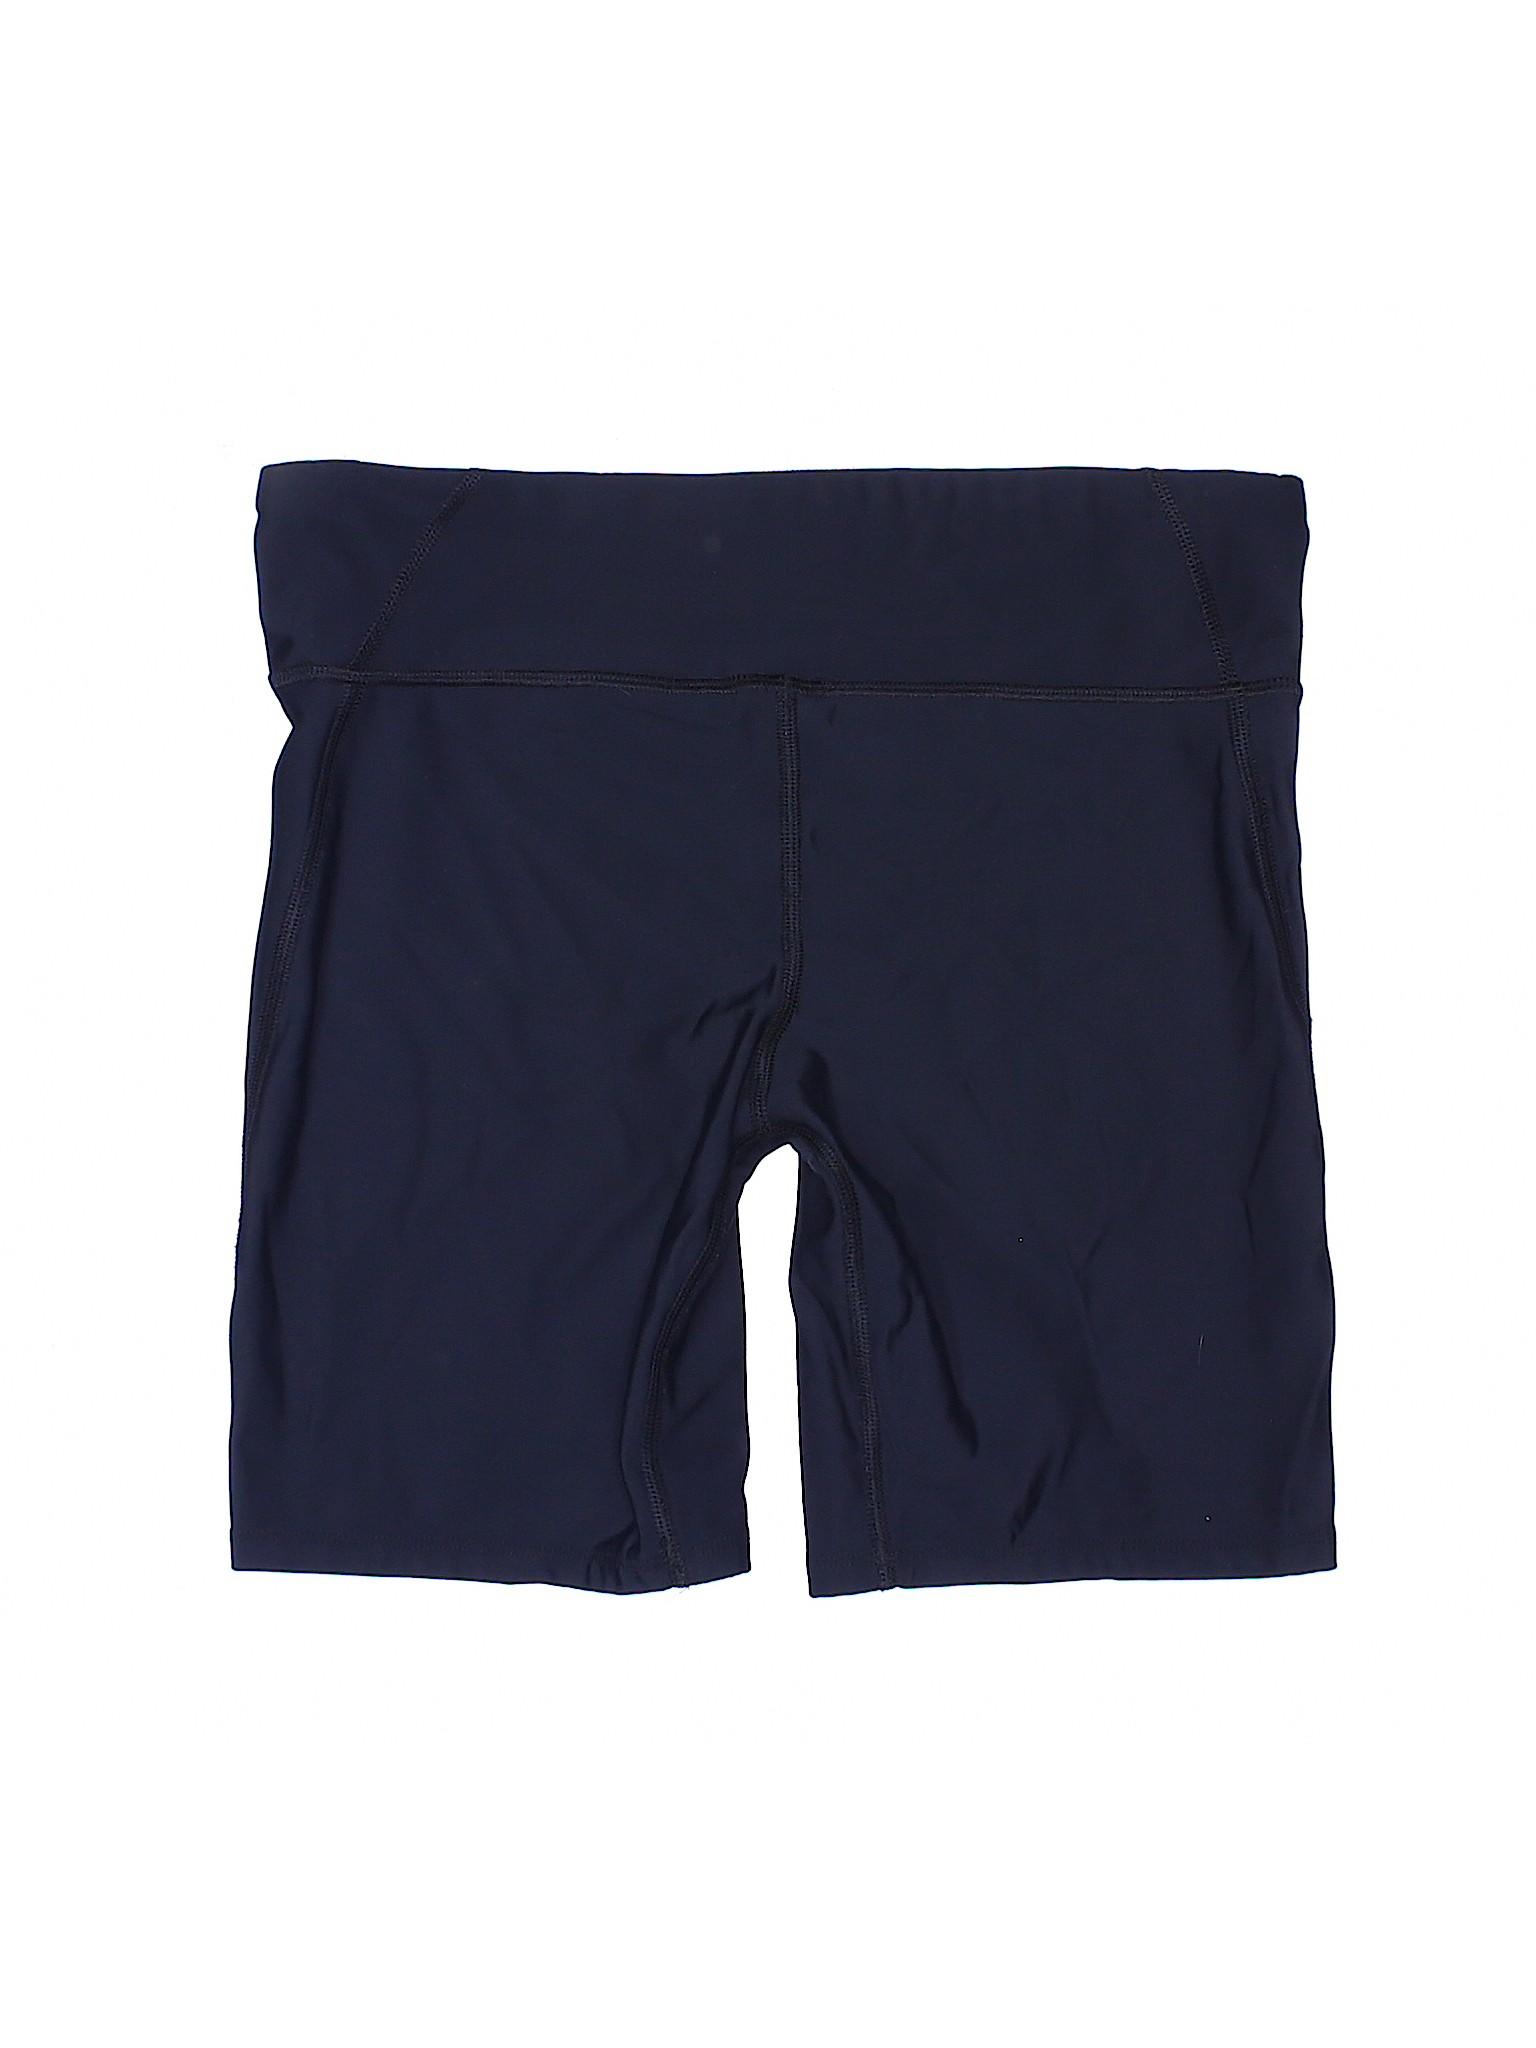 Athletic Boutique Armour Shorts Under leisure tPF7qw48